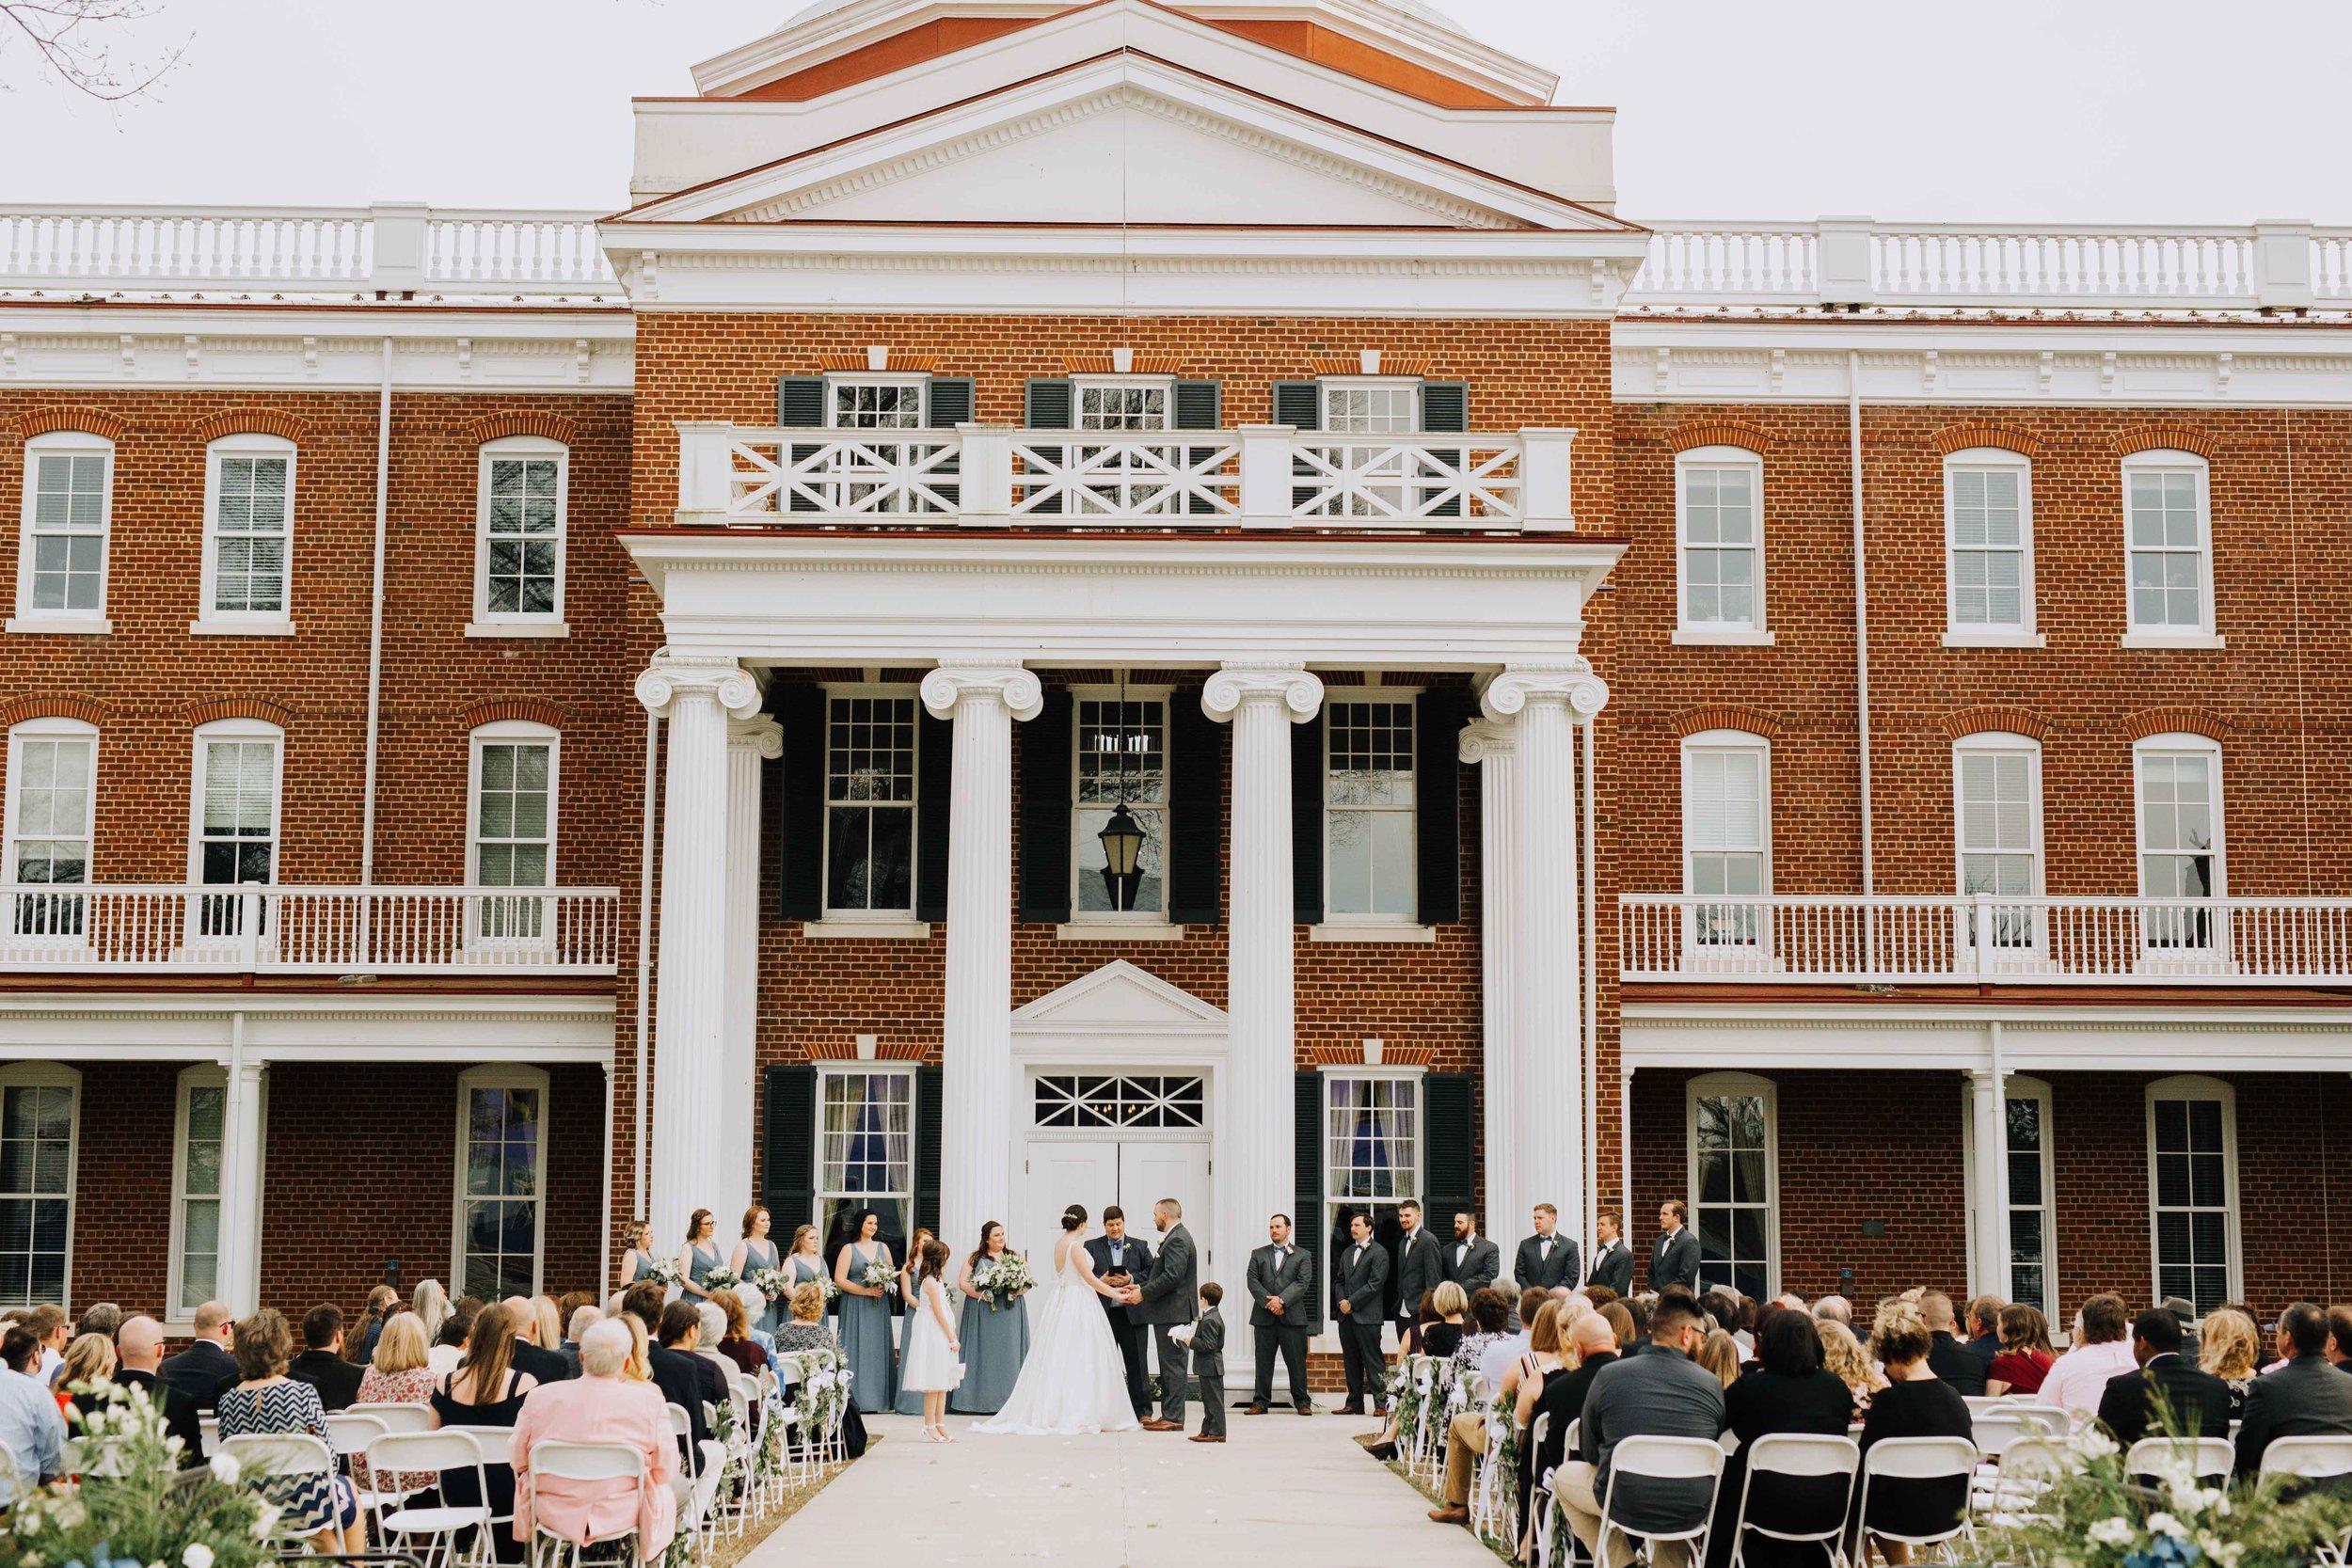 Farmville-Virginia-Wedding-Hotel-Weynoke-Downtown-Jacqueline-Waters-Photography-Detailed- (810).jpg